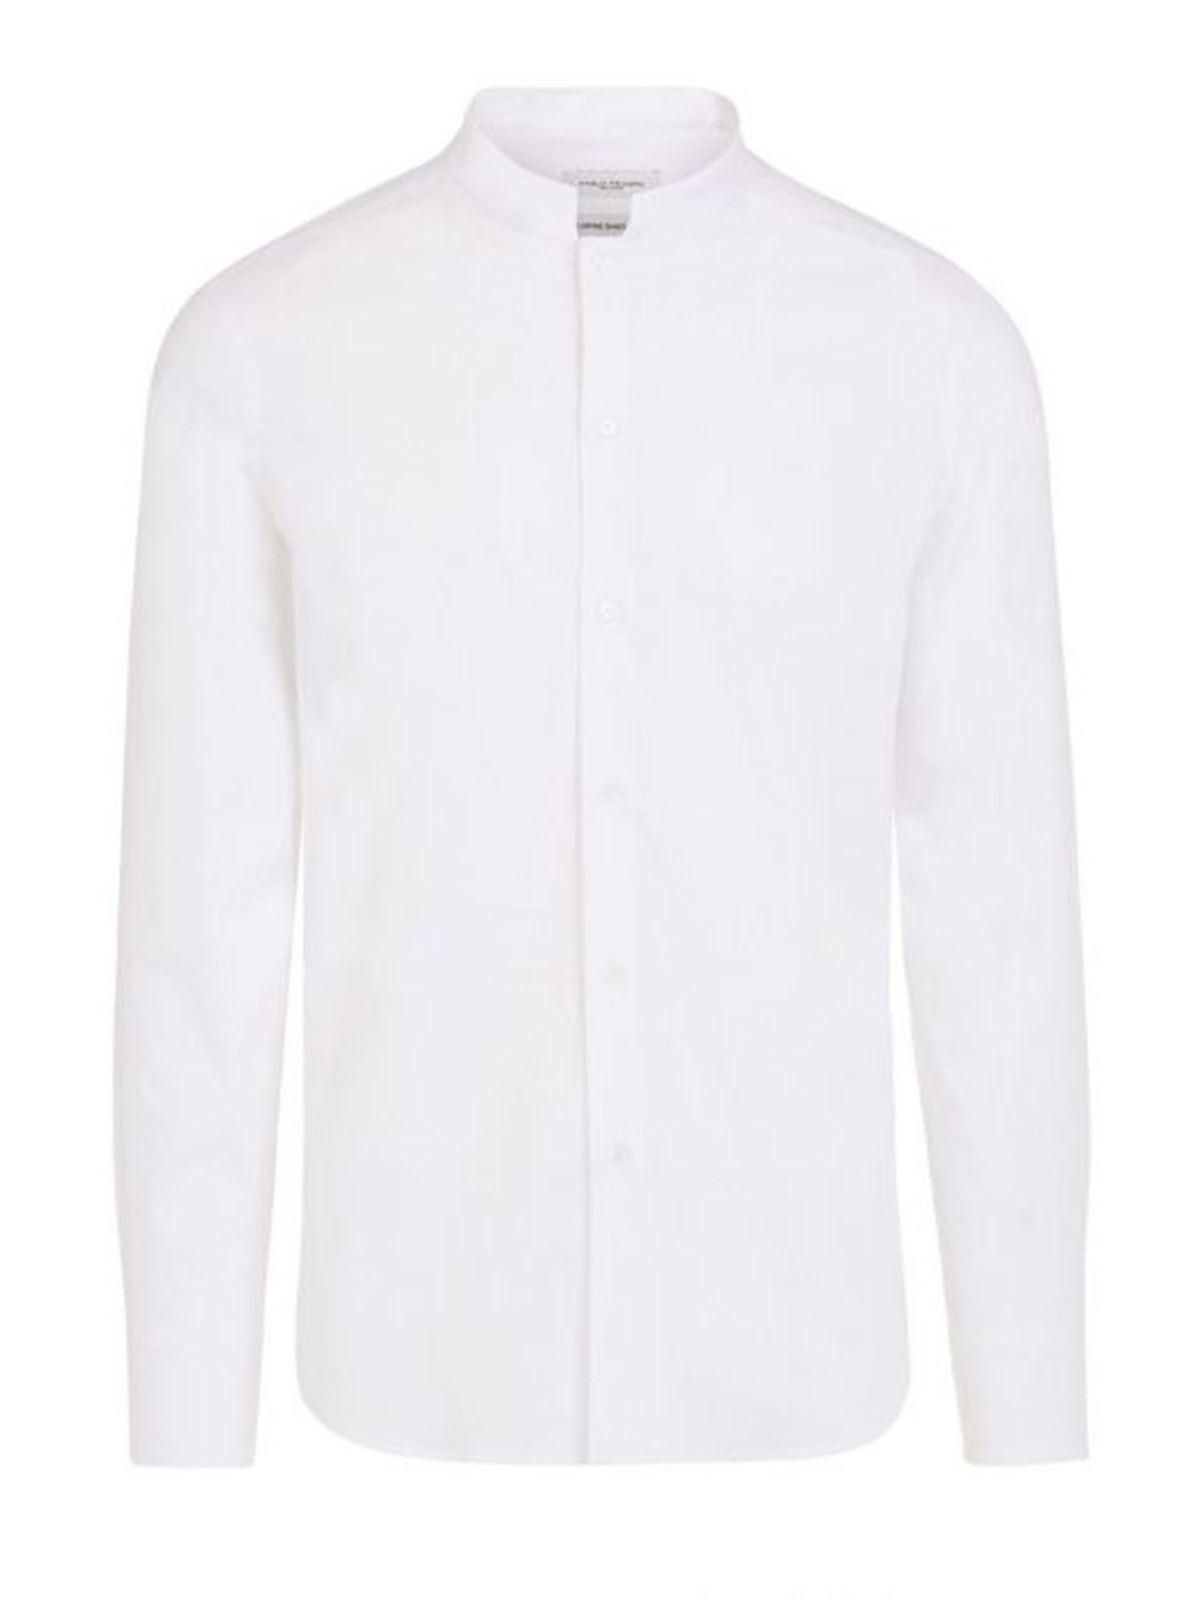 Paolo Pecora Mandarin Collar Shirt In White